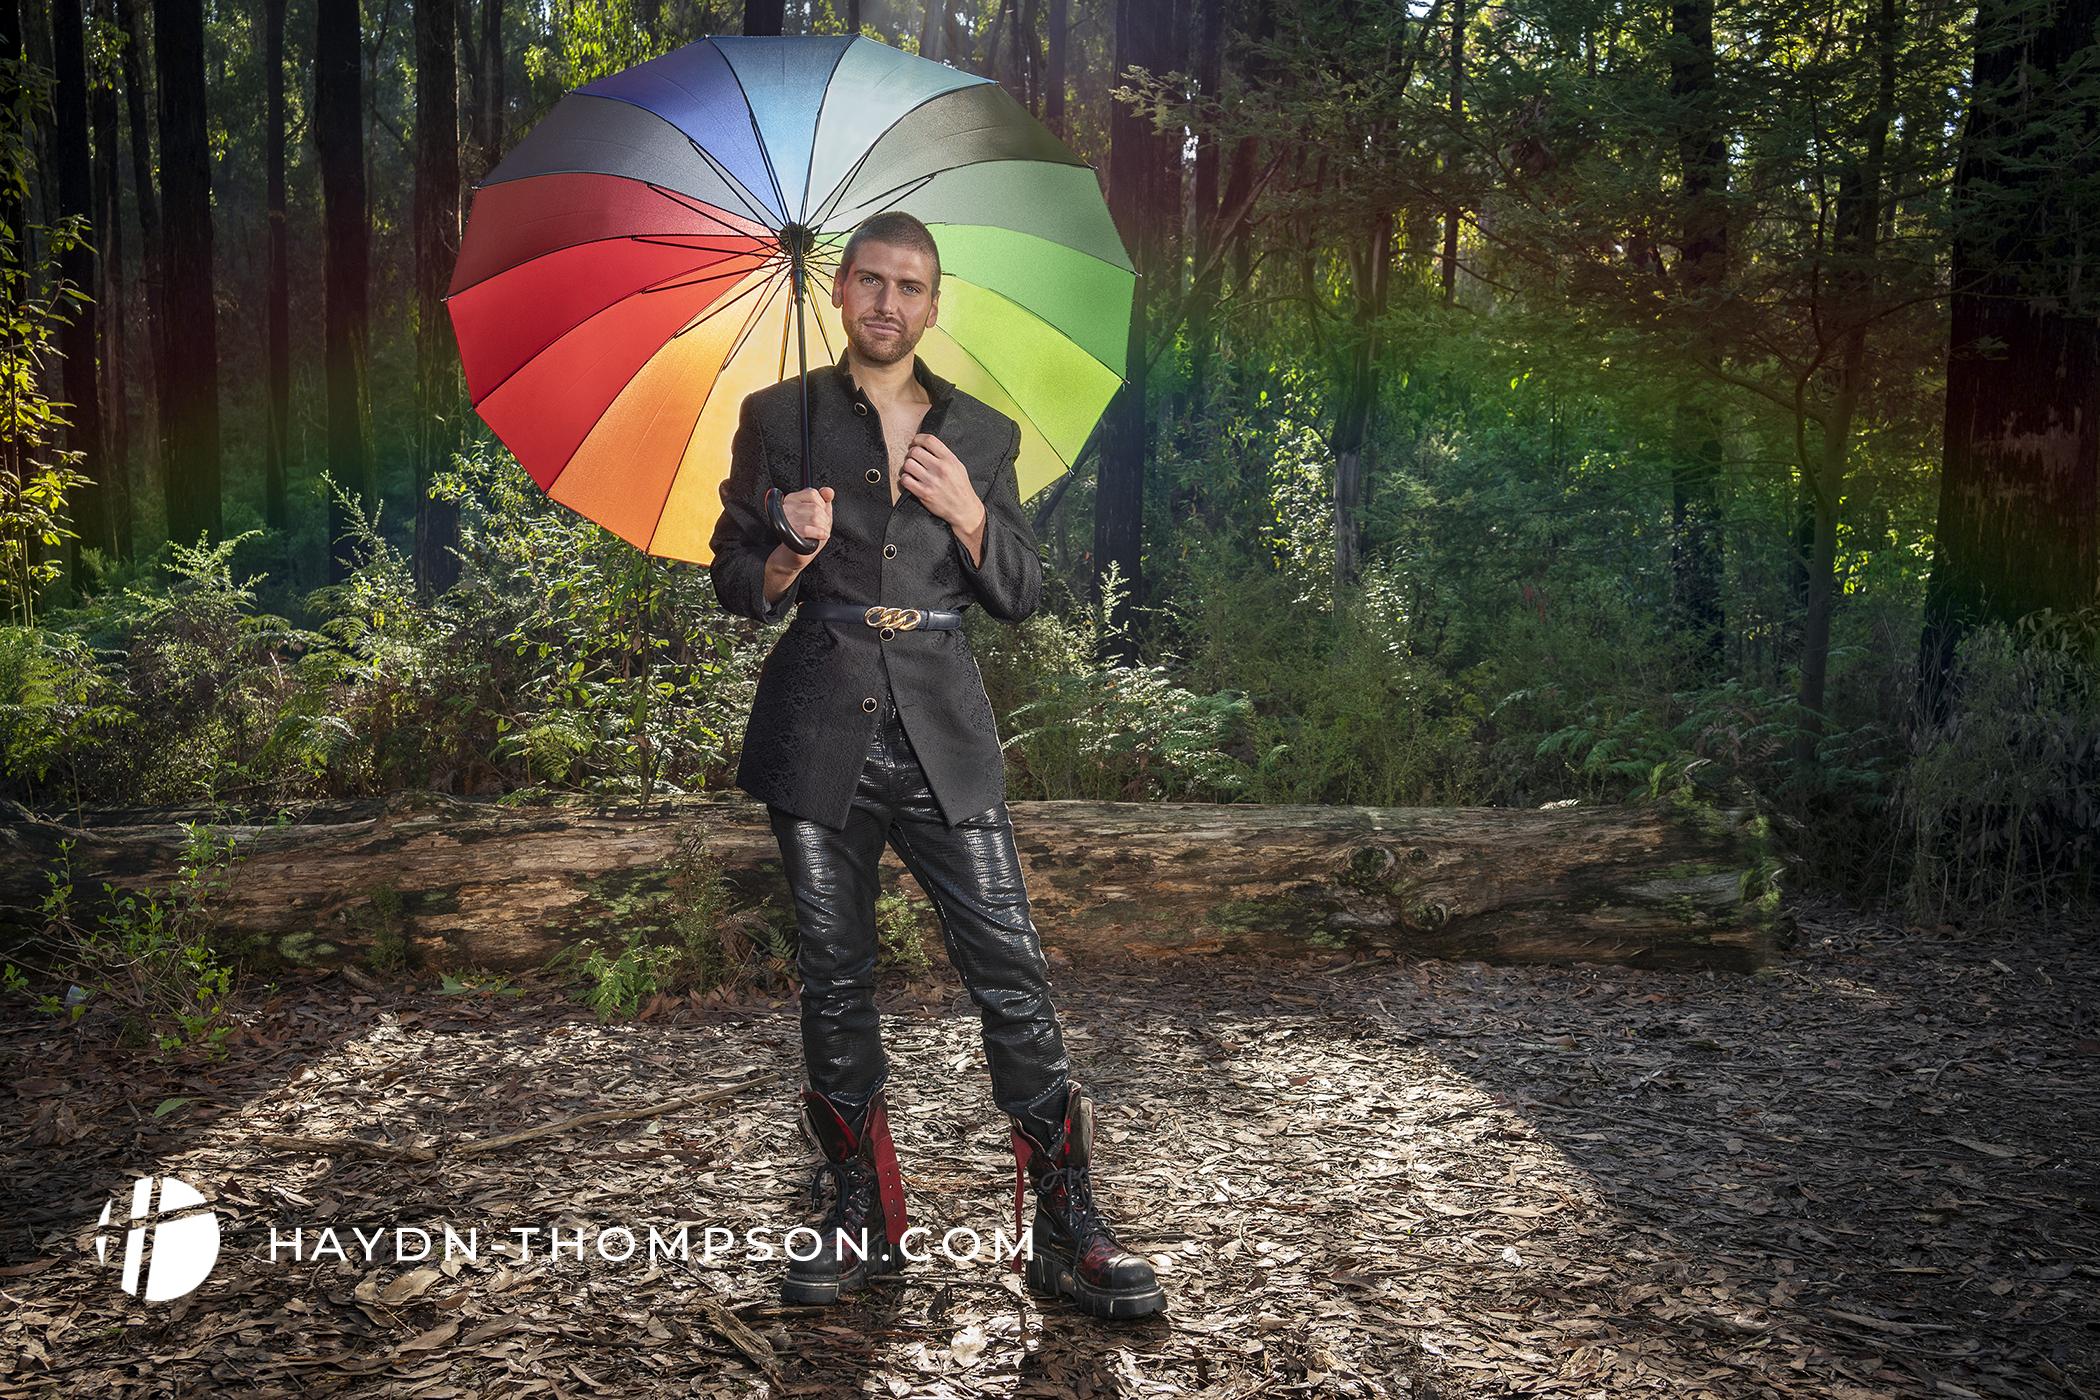 Rainbow Alignment - Black Outfit & Umbrella (Small Size - Watermark).jpg